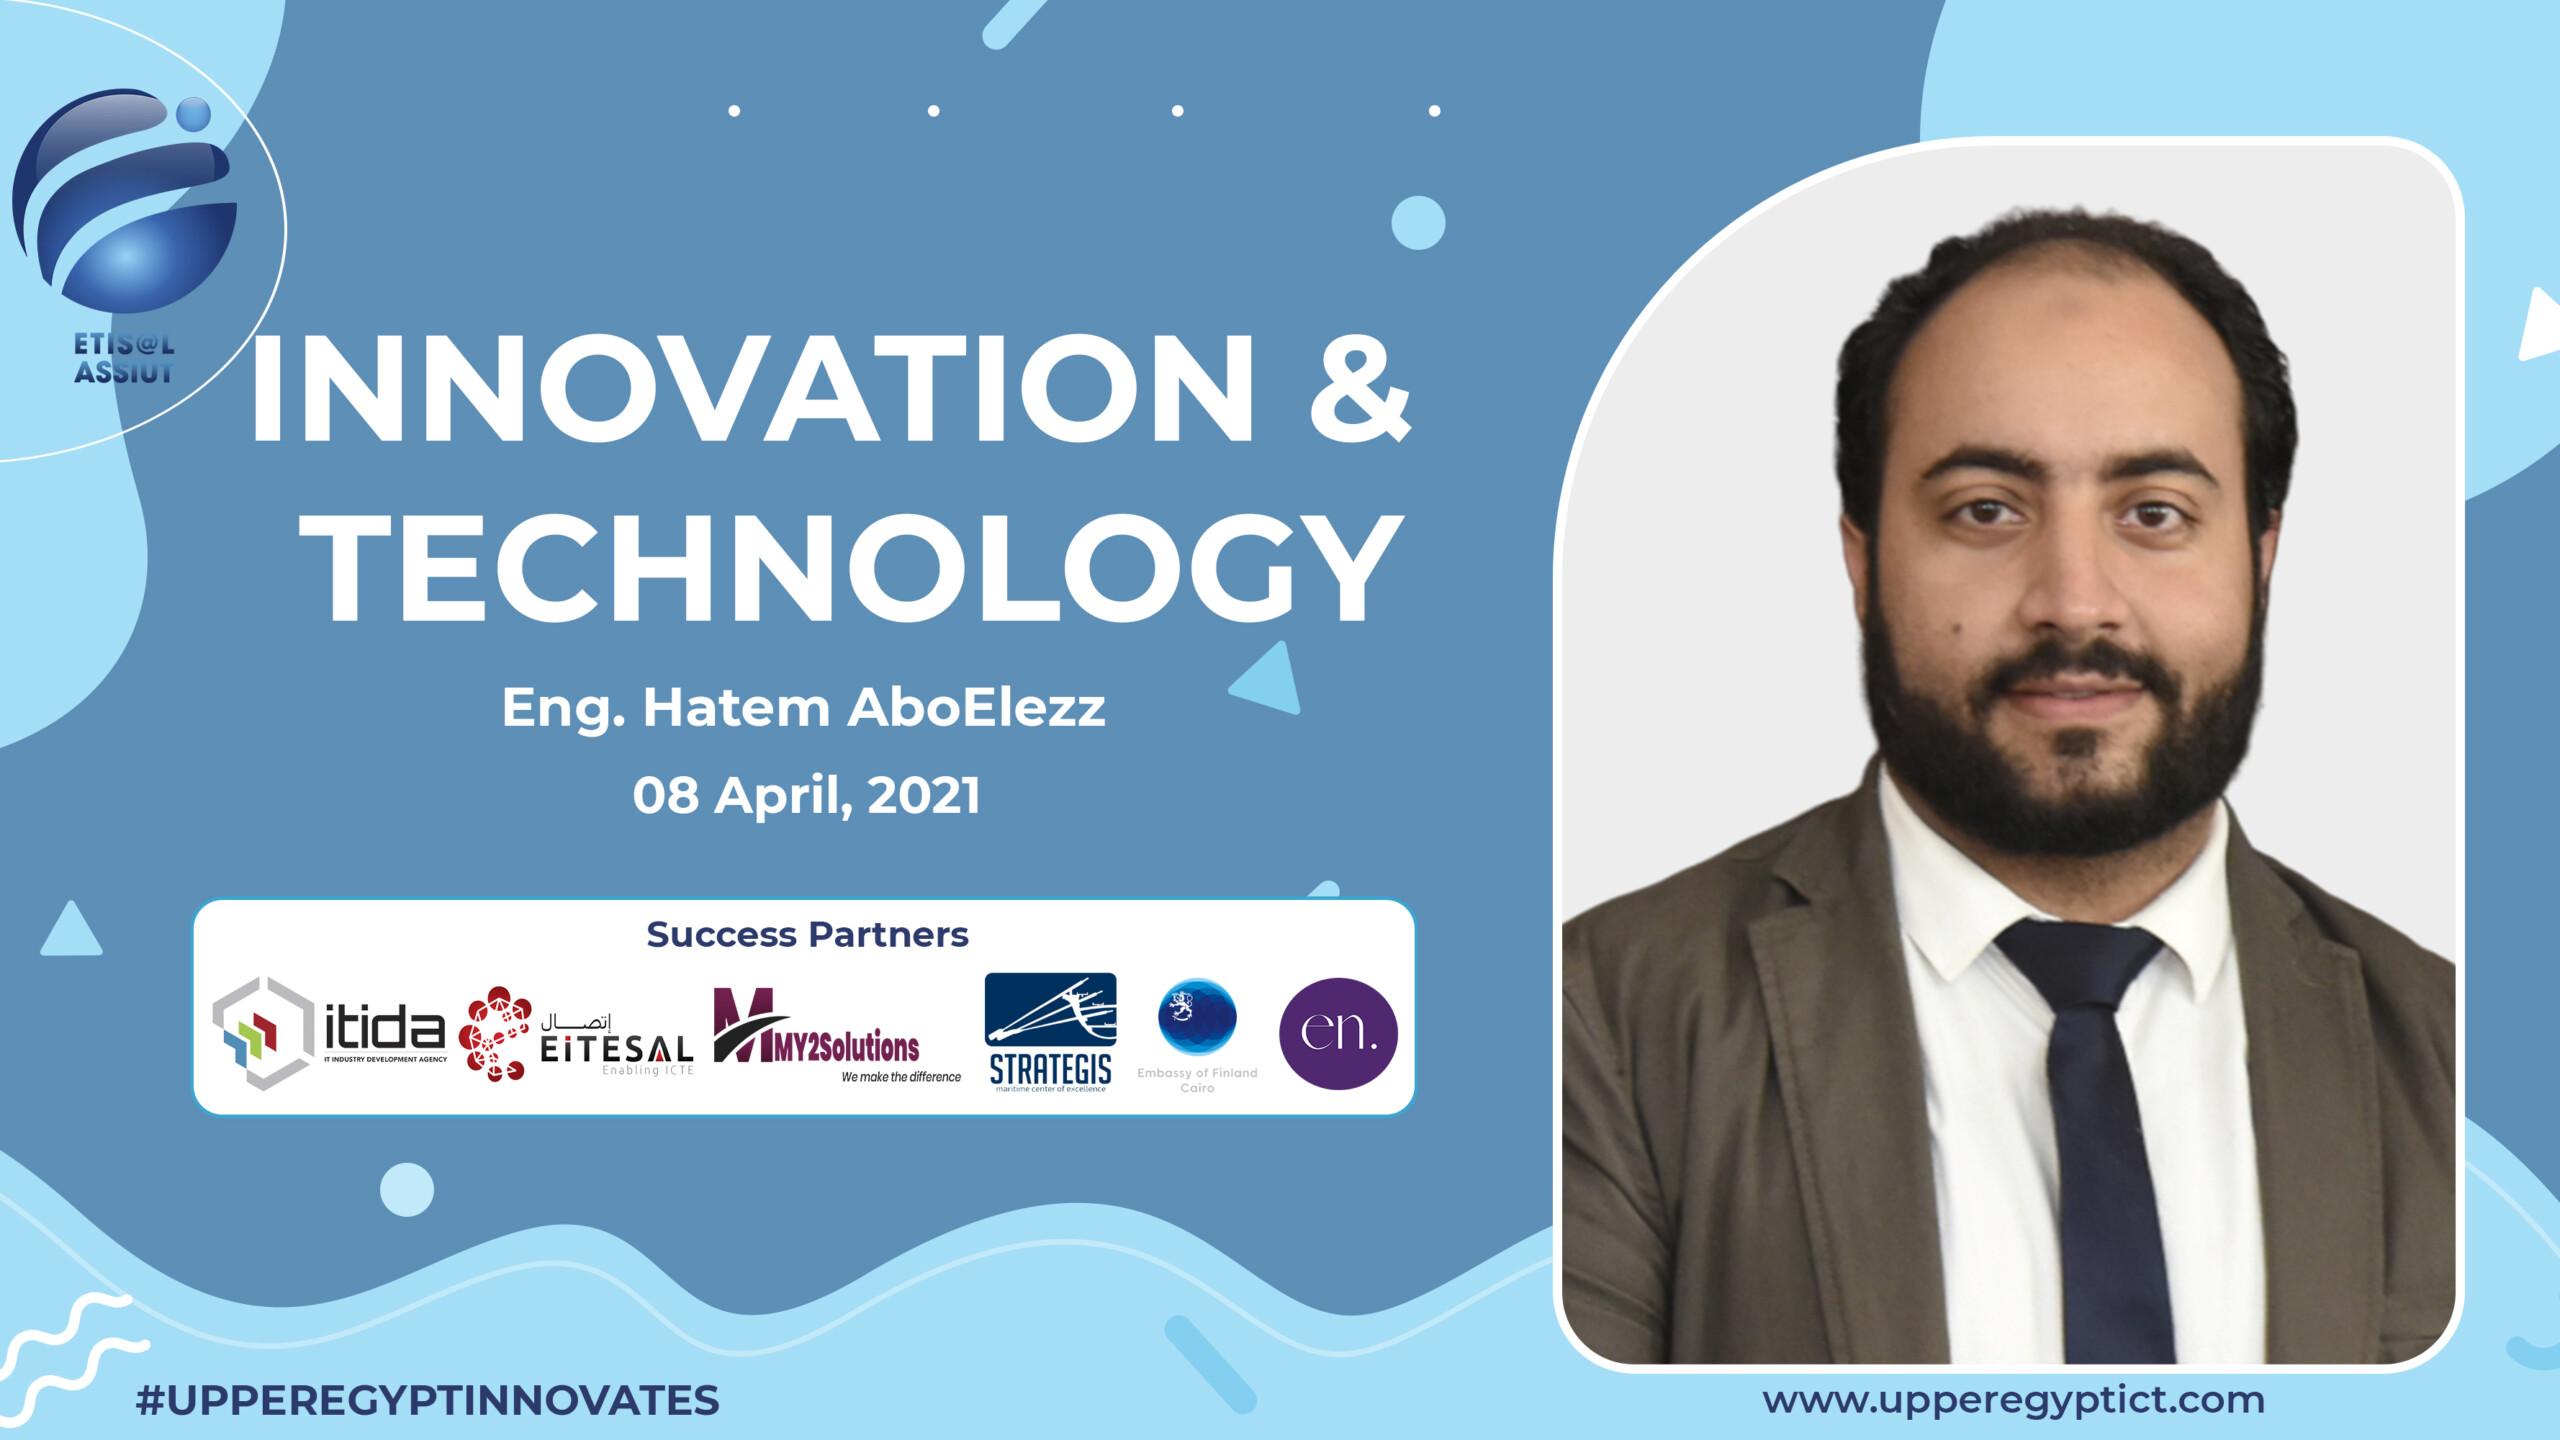 Innovation & Technology Workshop